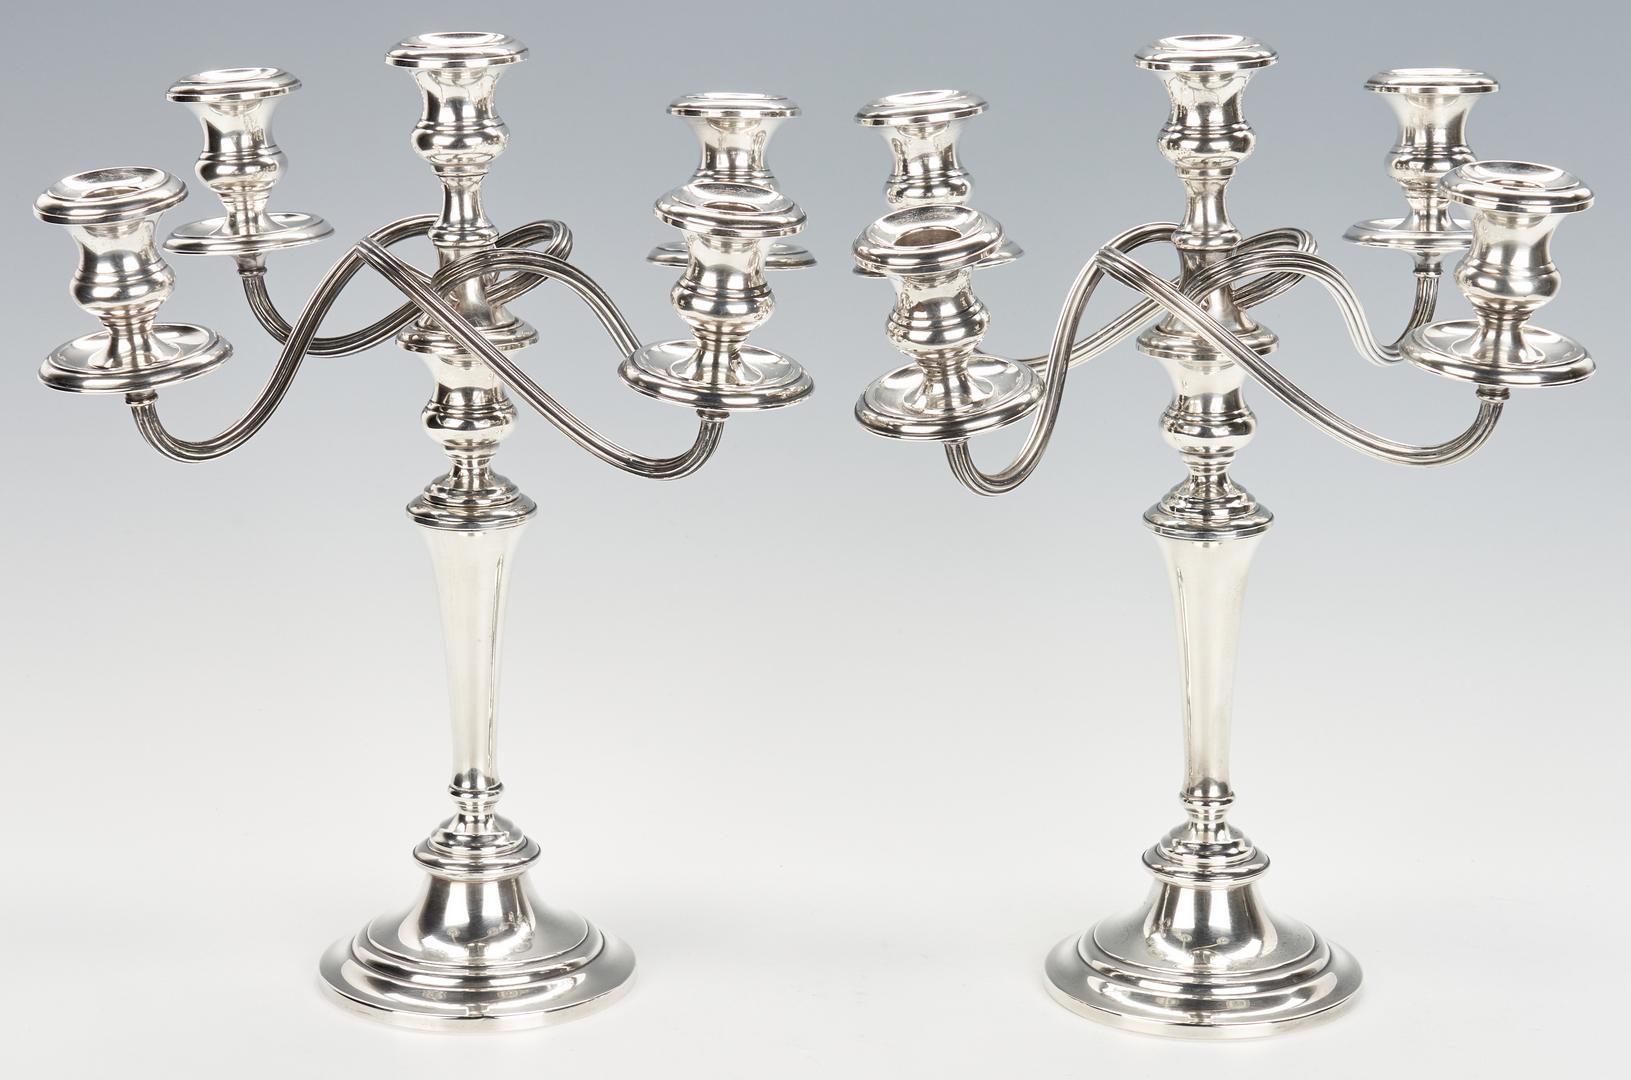 Lot 1039: Pair of Gorham 5-Arm Sterling Silver Candelabras